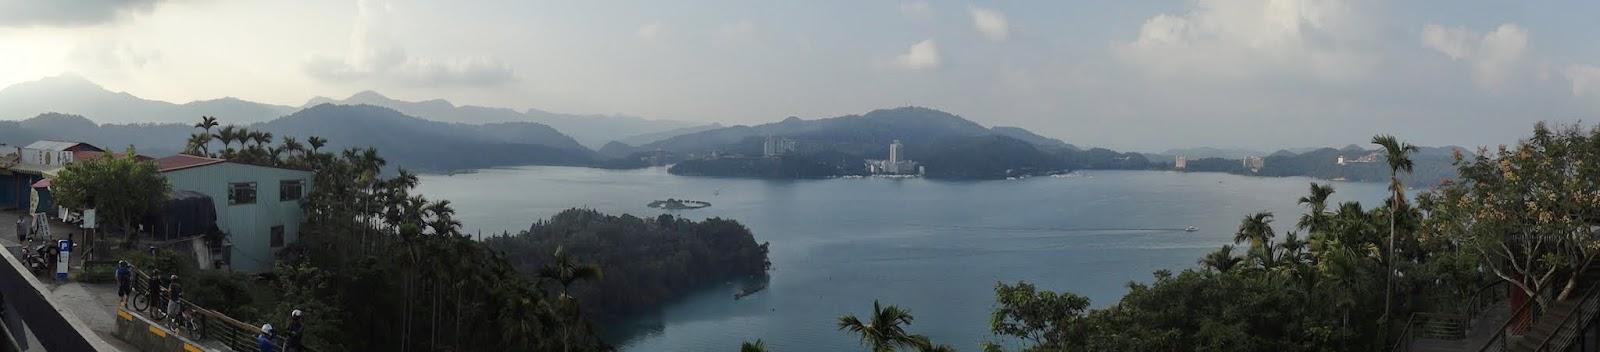 Breathtaking panorama viewe of Sun Moon Lake and Lalu Island from Xuanzang Temple at Nantou County of Taiwan